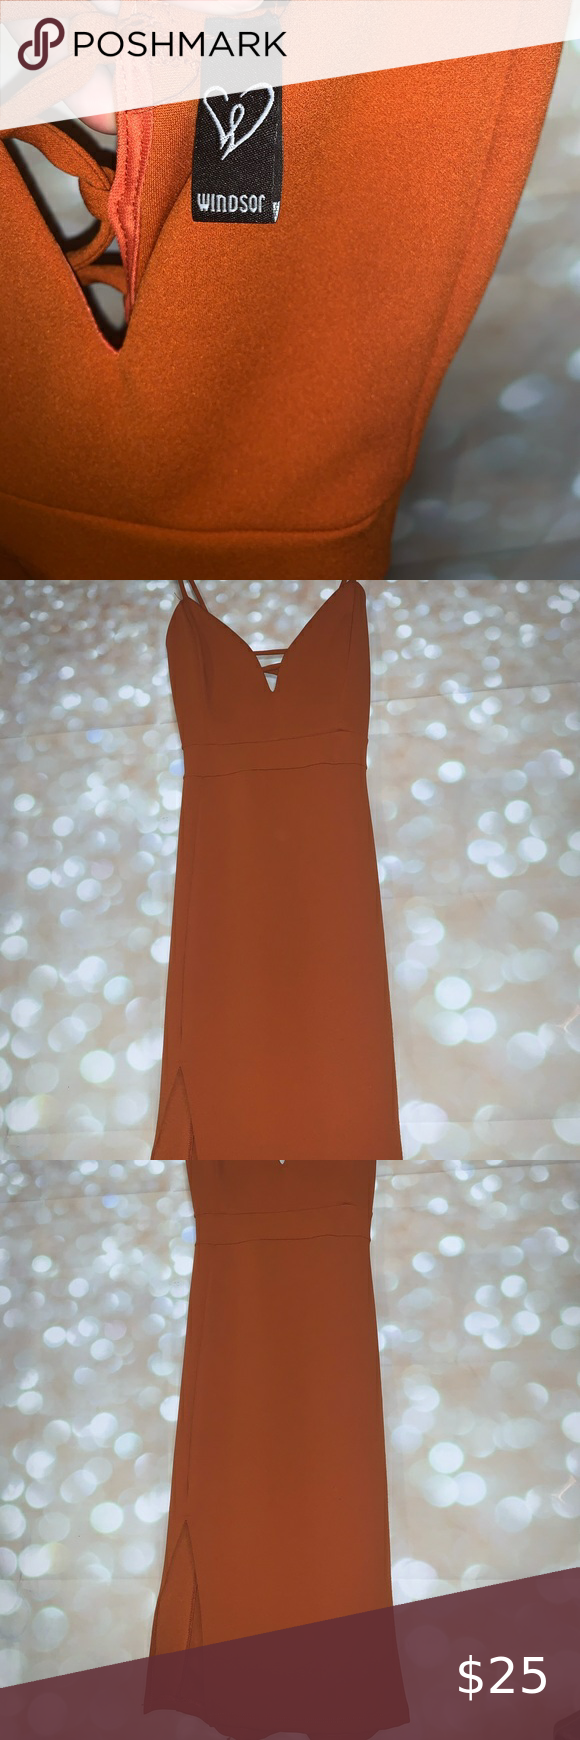 Smocked Top Wrap Dress Stretchy Strappy Long Dress Flowy Ruffle Maxi Dress Tube Top Dress Dresses Womens Long Dresses [ 1774 x 1000 Pixel ]